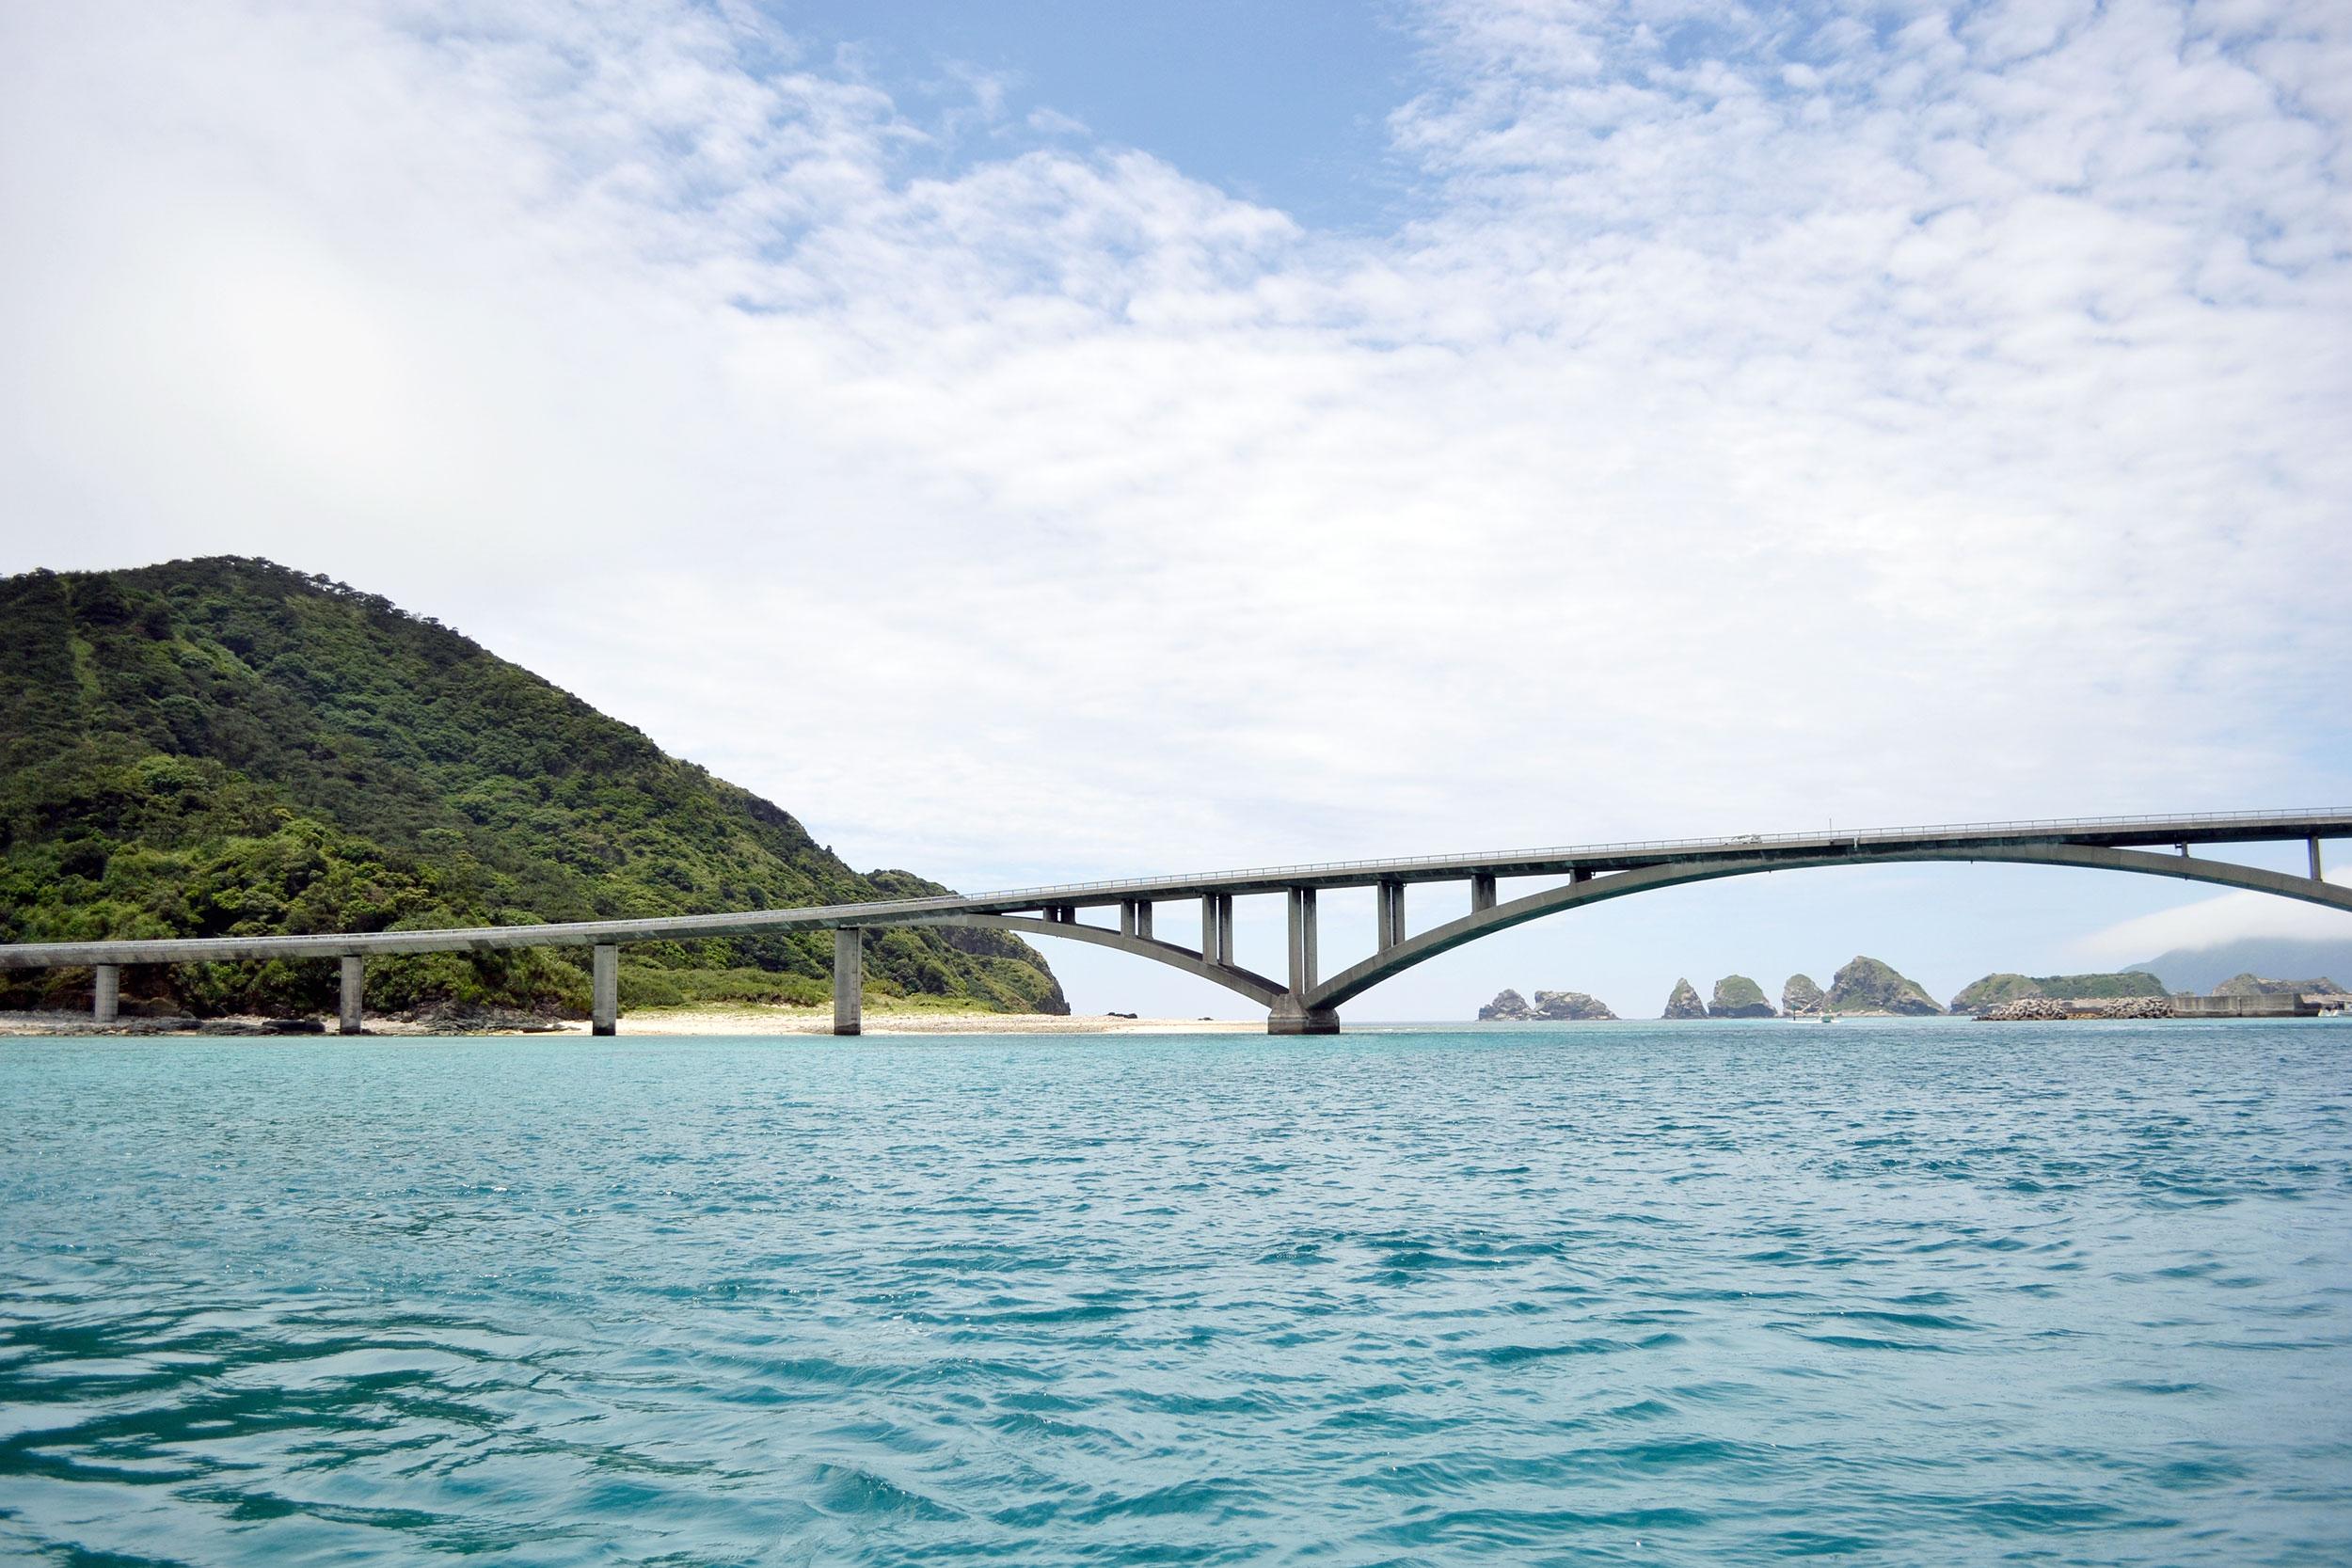 A bridge on Aka Island, Okinawa